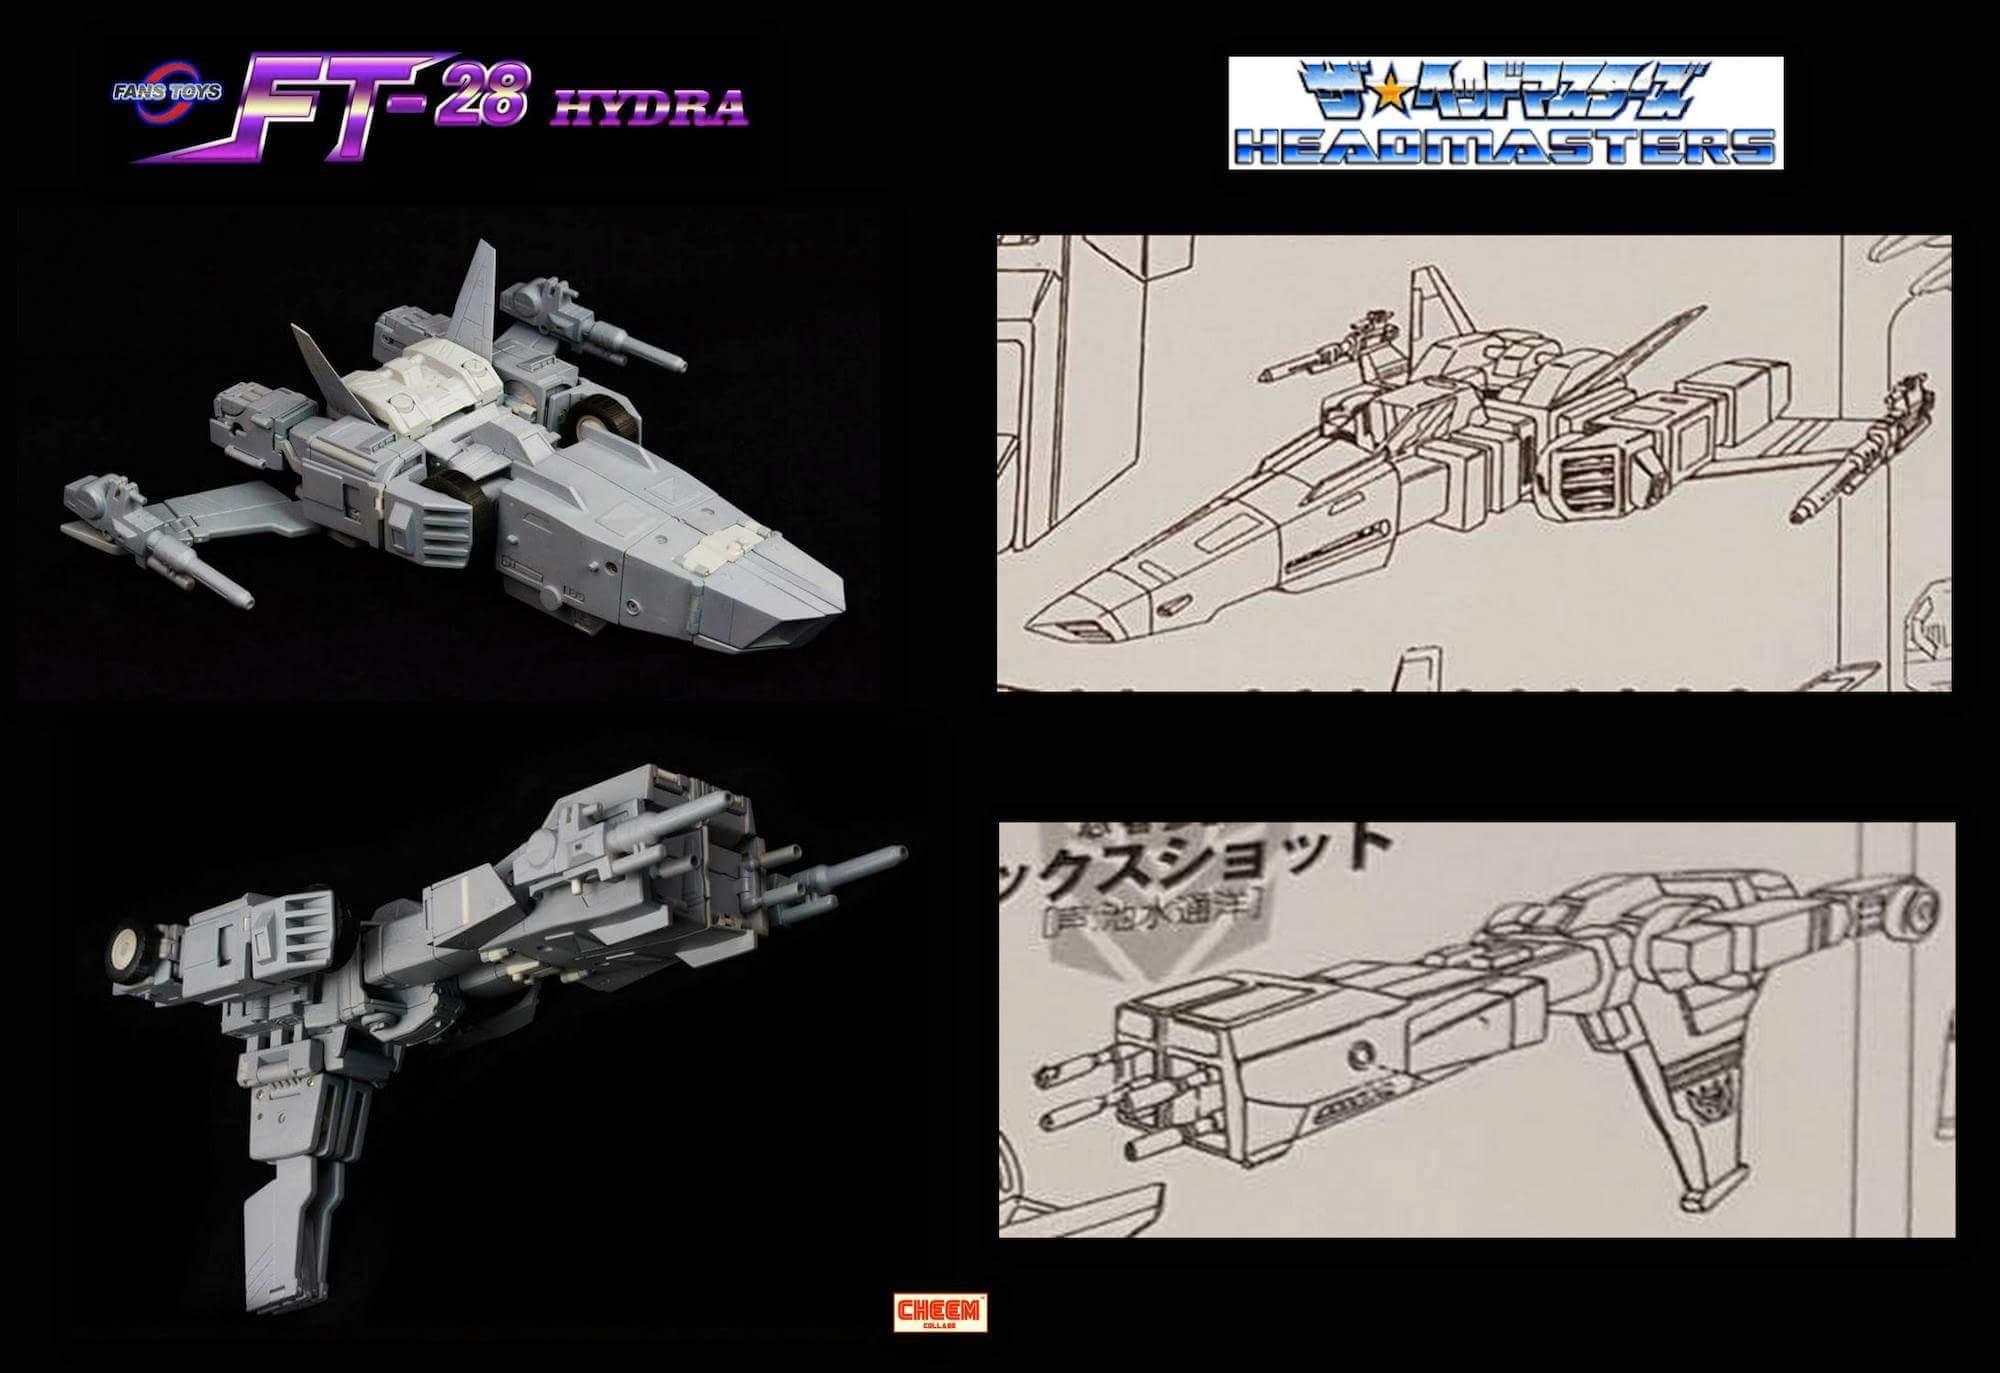 [Fanstoys] Produit Tiers - Jouet FT-28 Hydra aka Sixshot/Hexabot EFFuwGh0